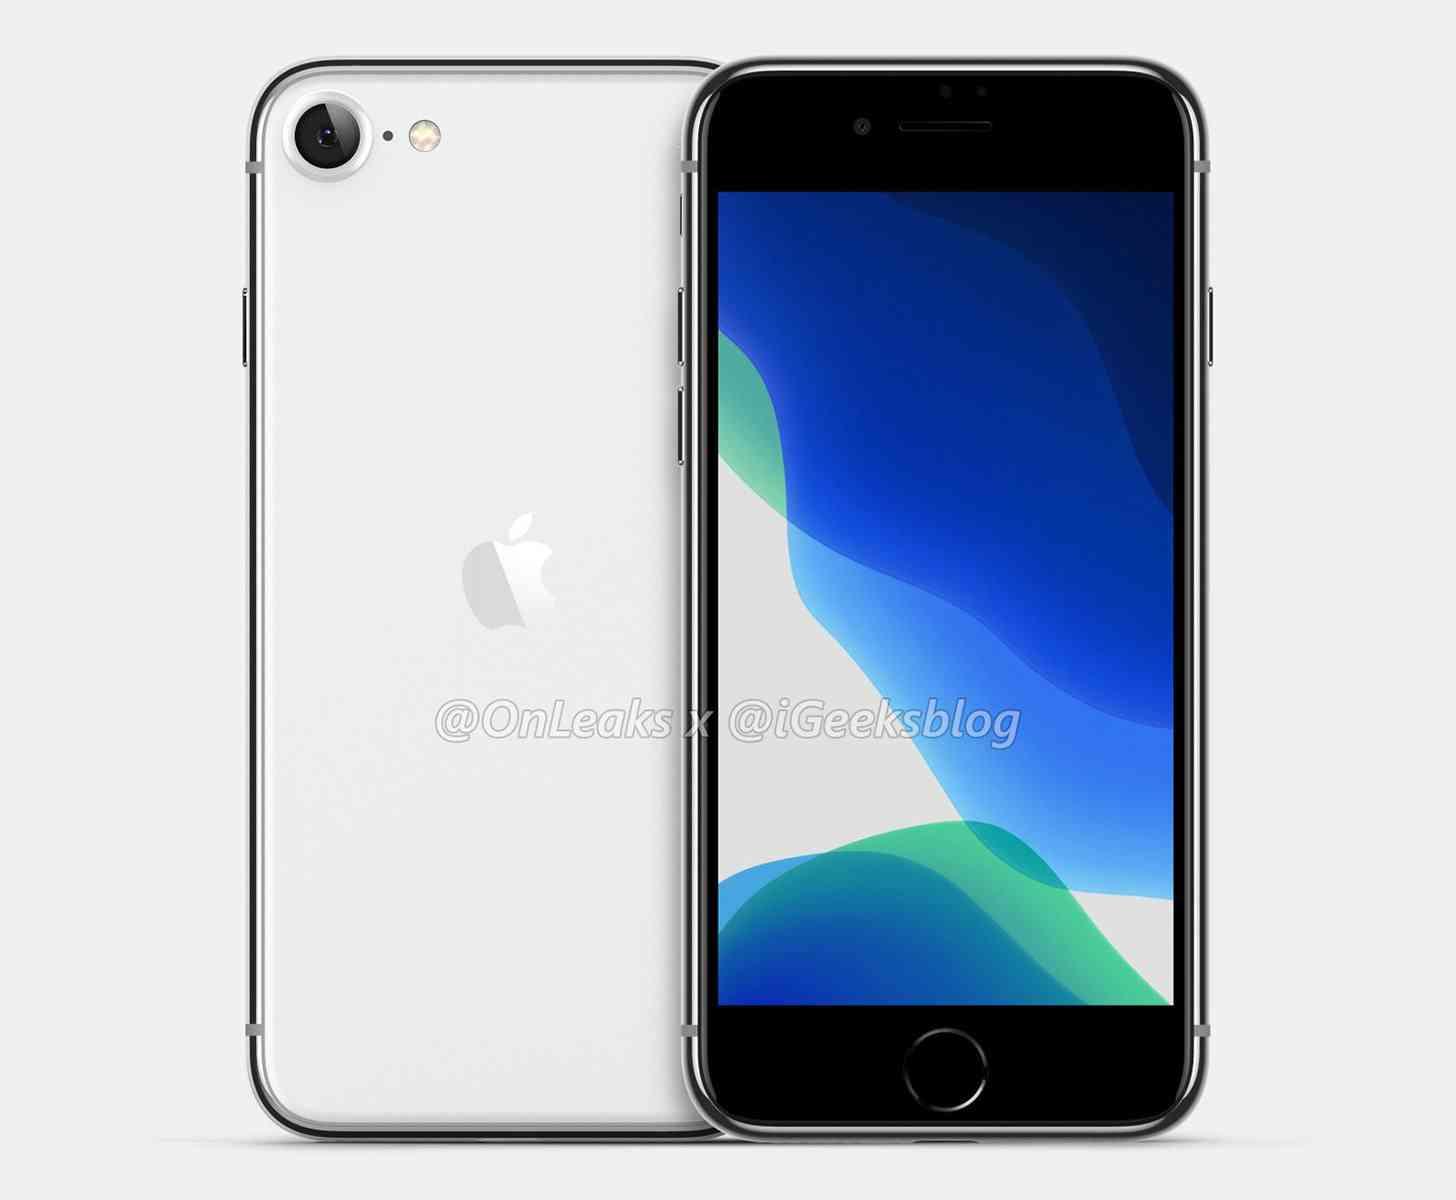 iPhone SE 2 render leak